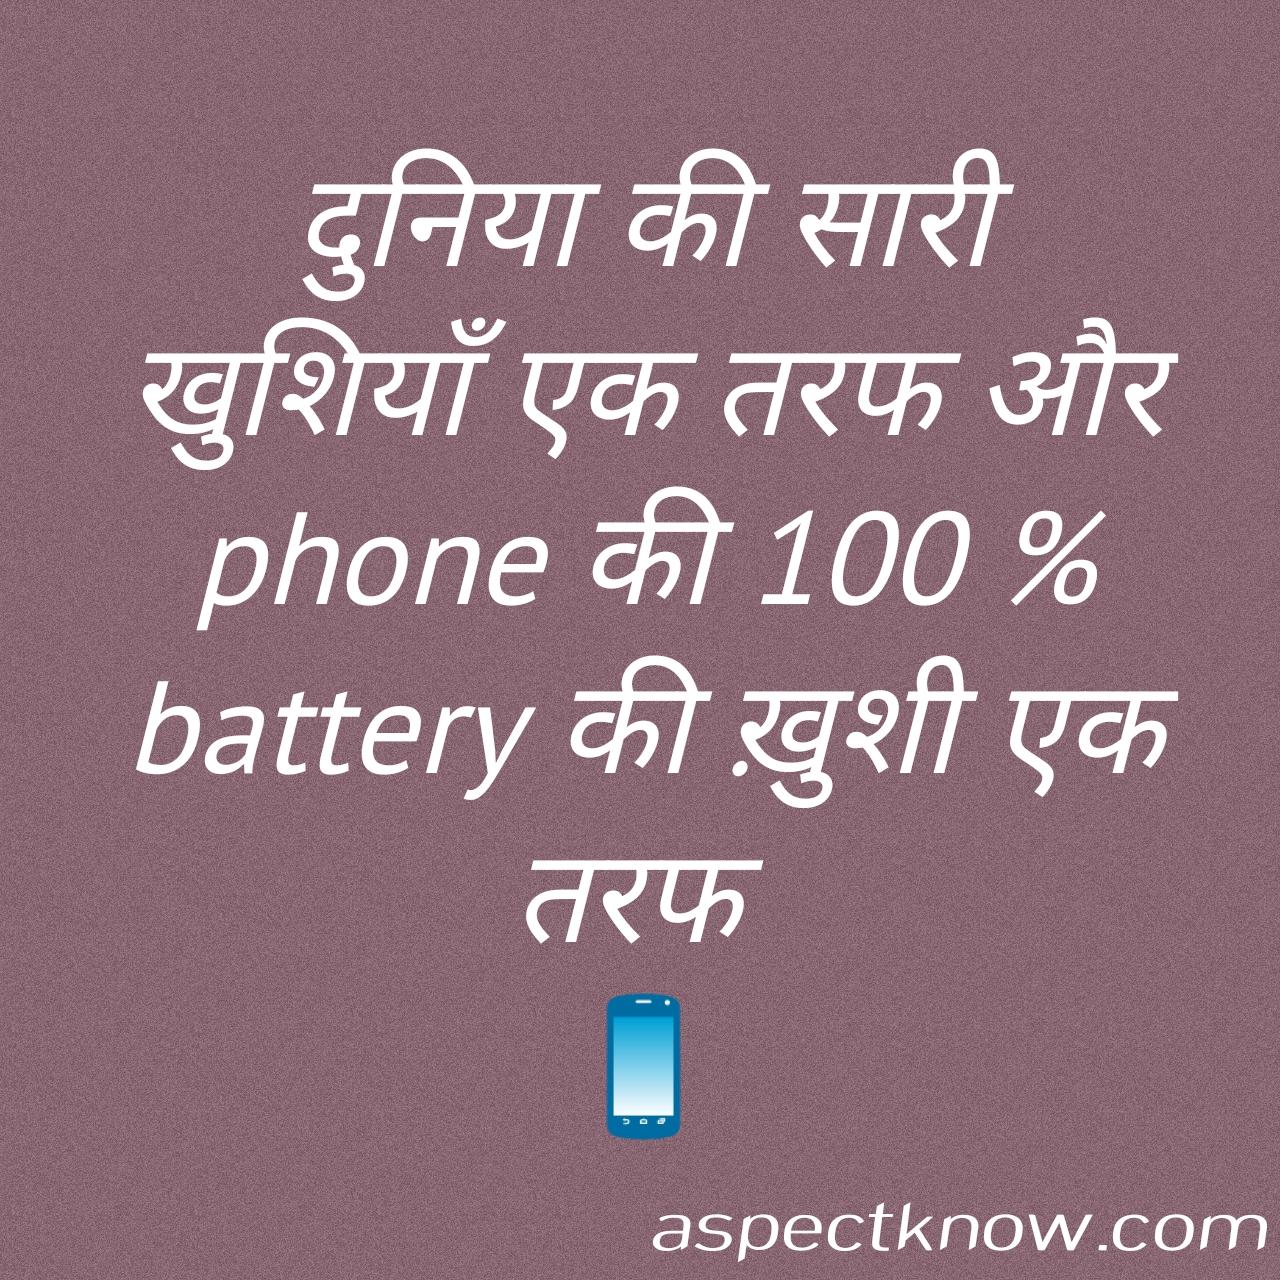 Funny Status in Hindi